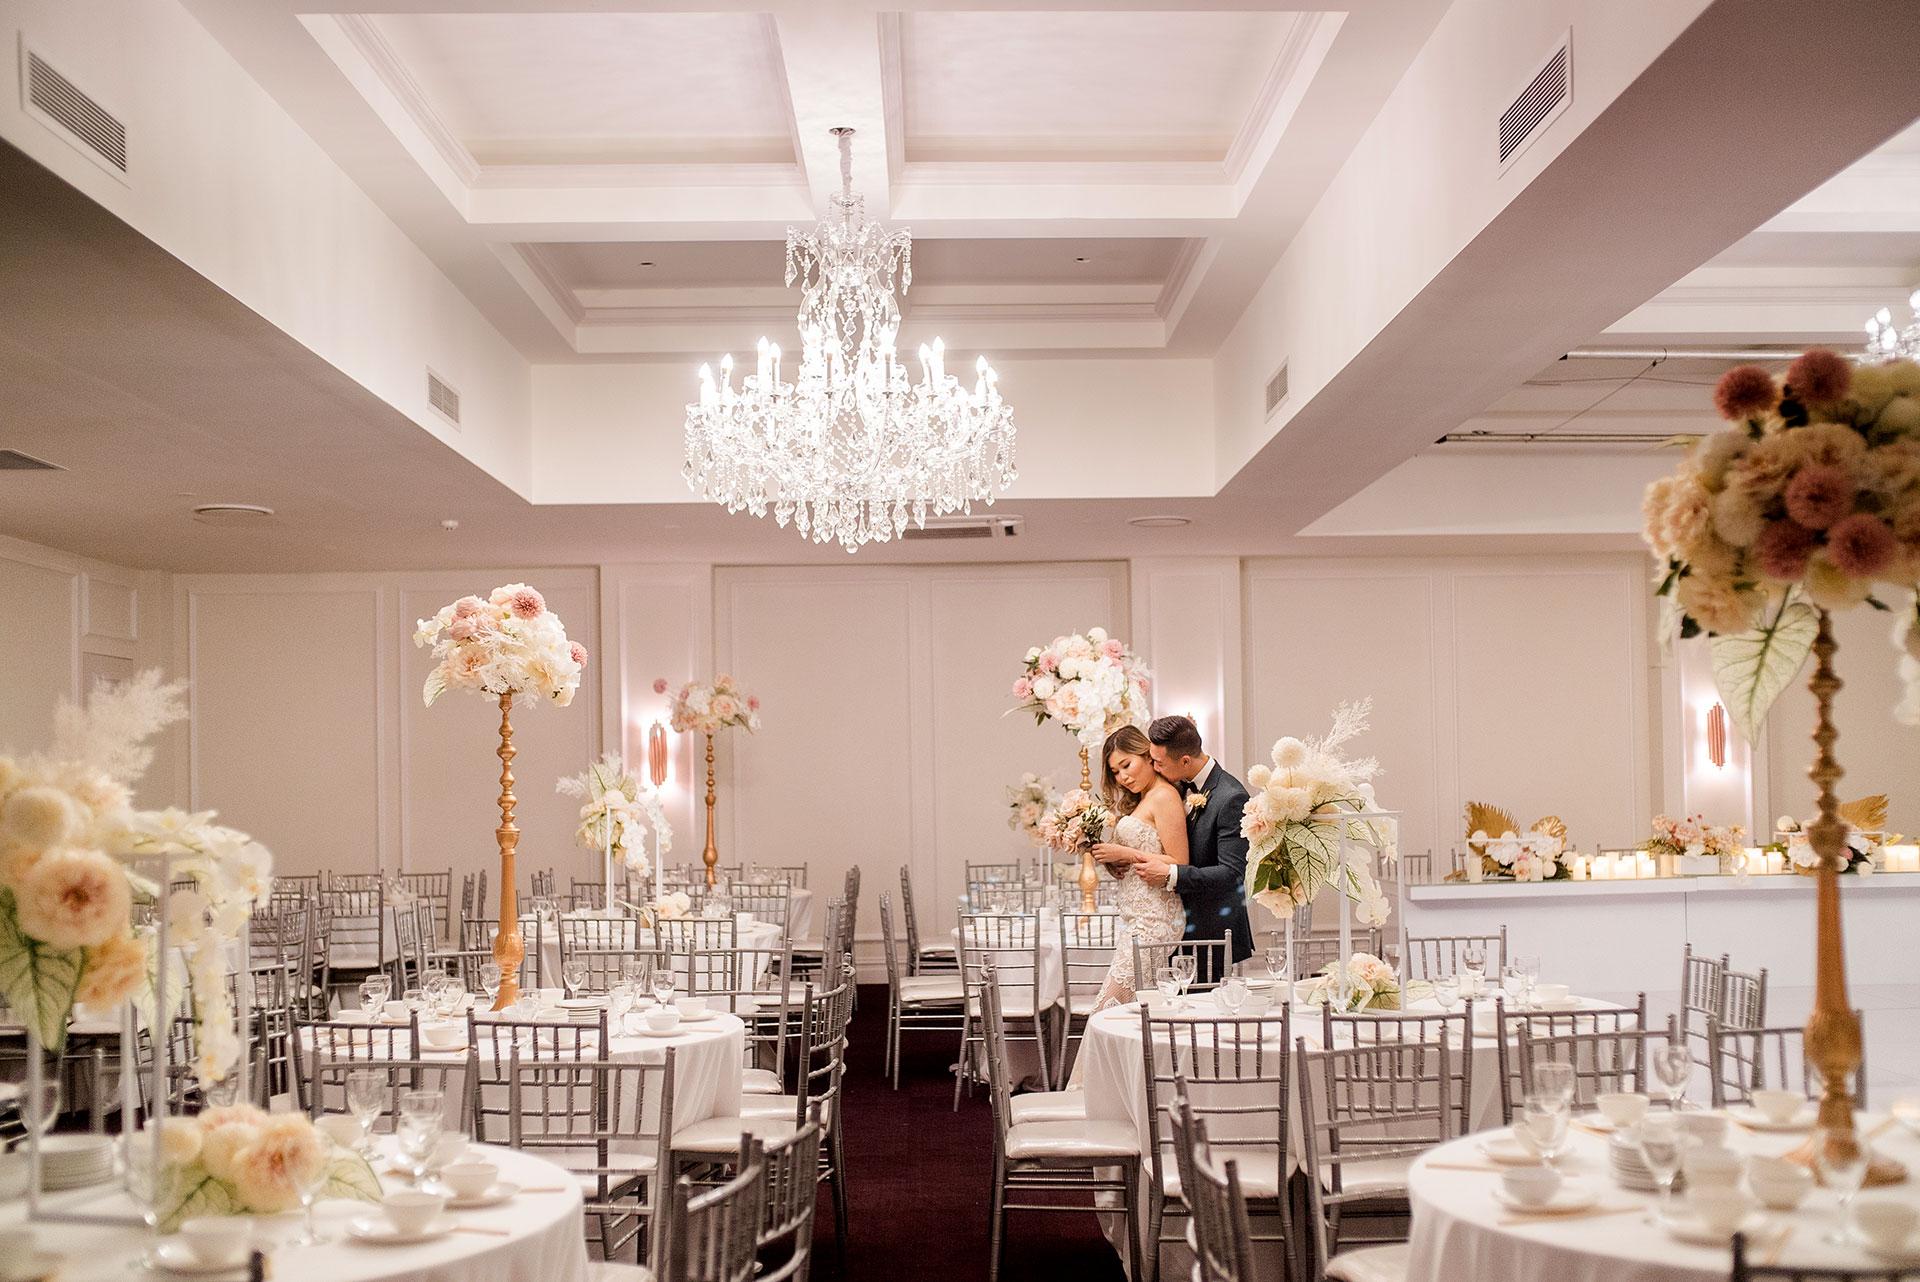 cabramatta-seafood-wedding-venue.jpg